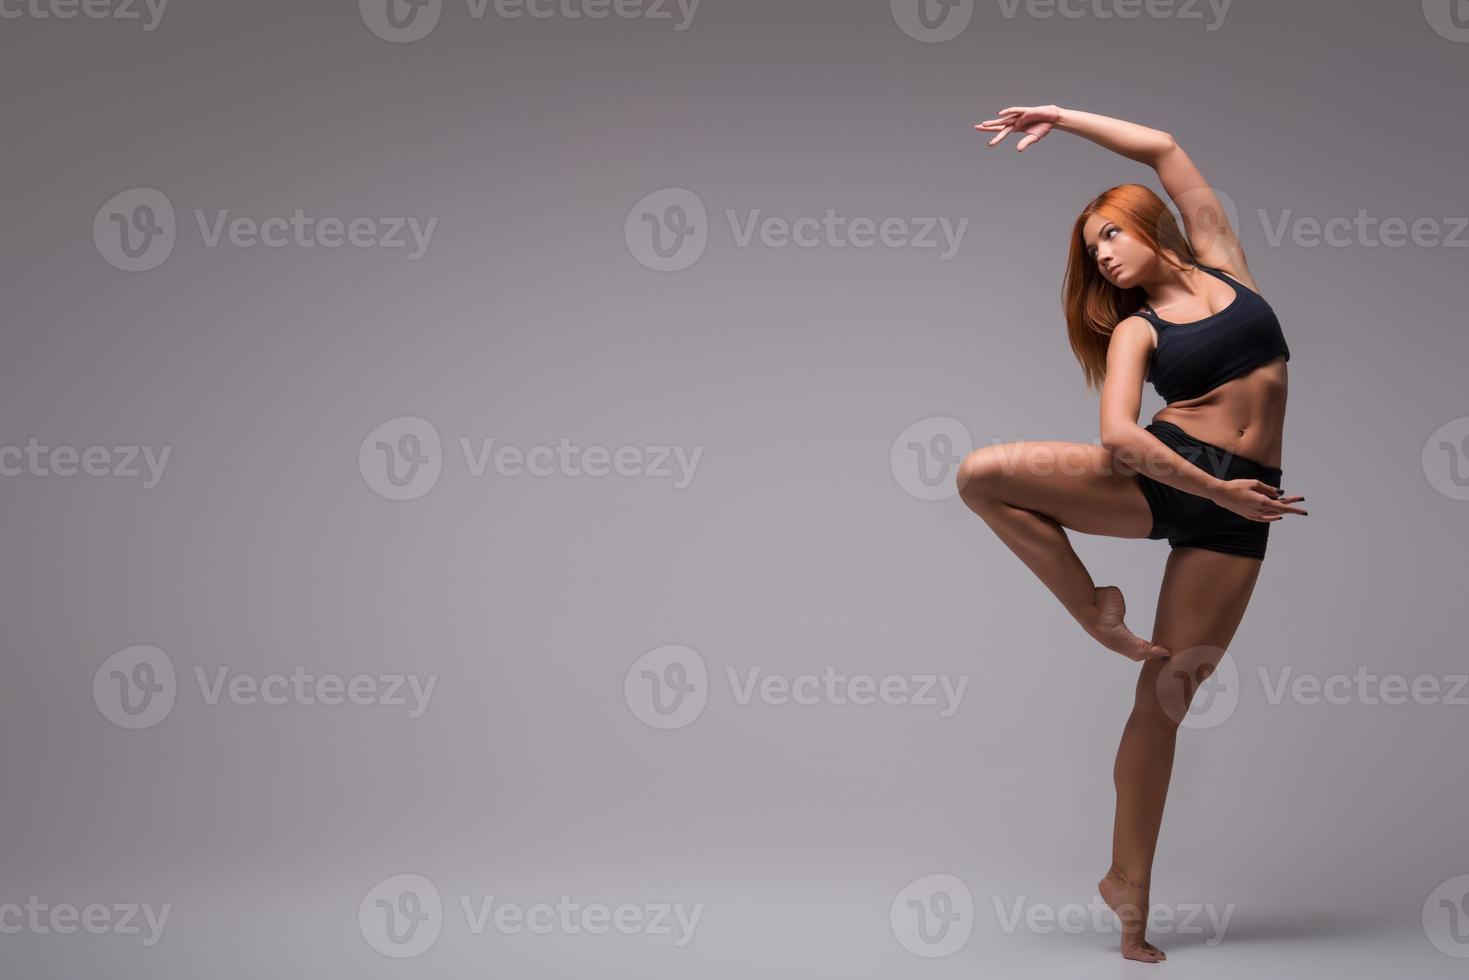 mujer gimnasta estiramiento foto